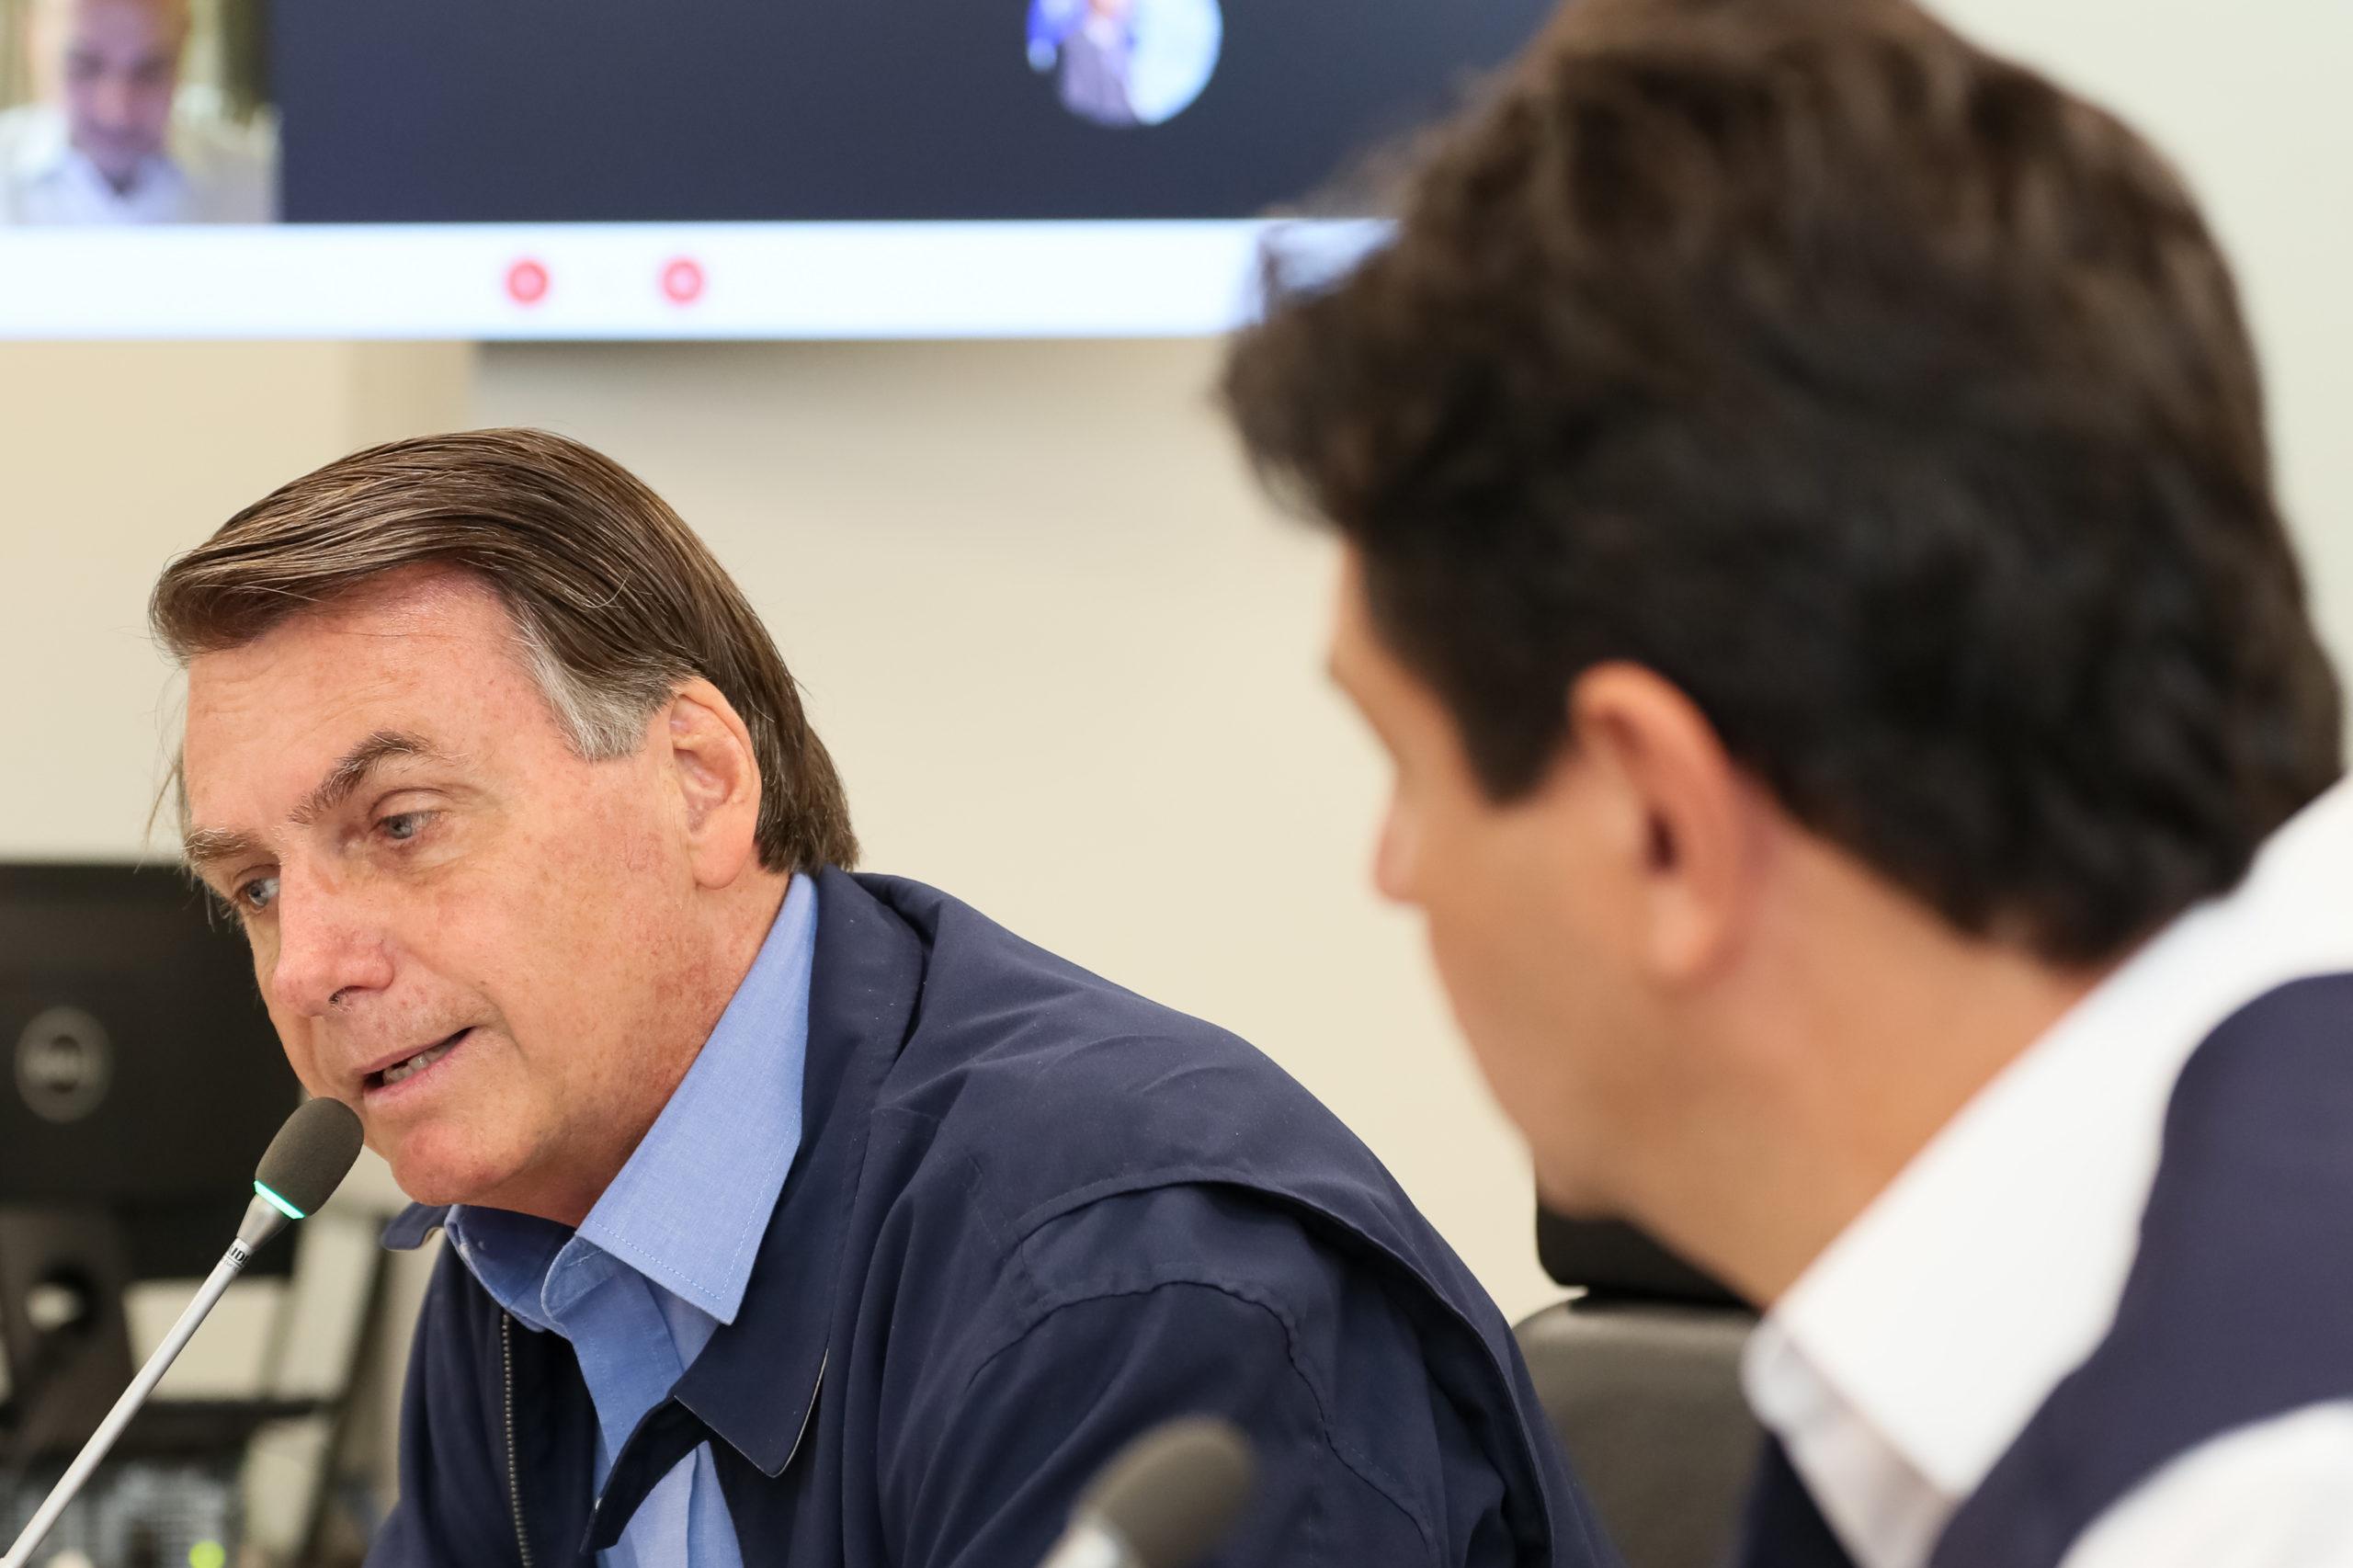 Coronavírus: Bolsonaro pede ao governo indiano apoio para viabilizar insumos farmacêuticos